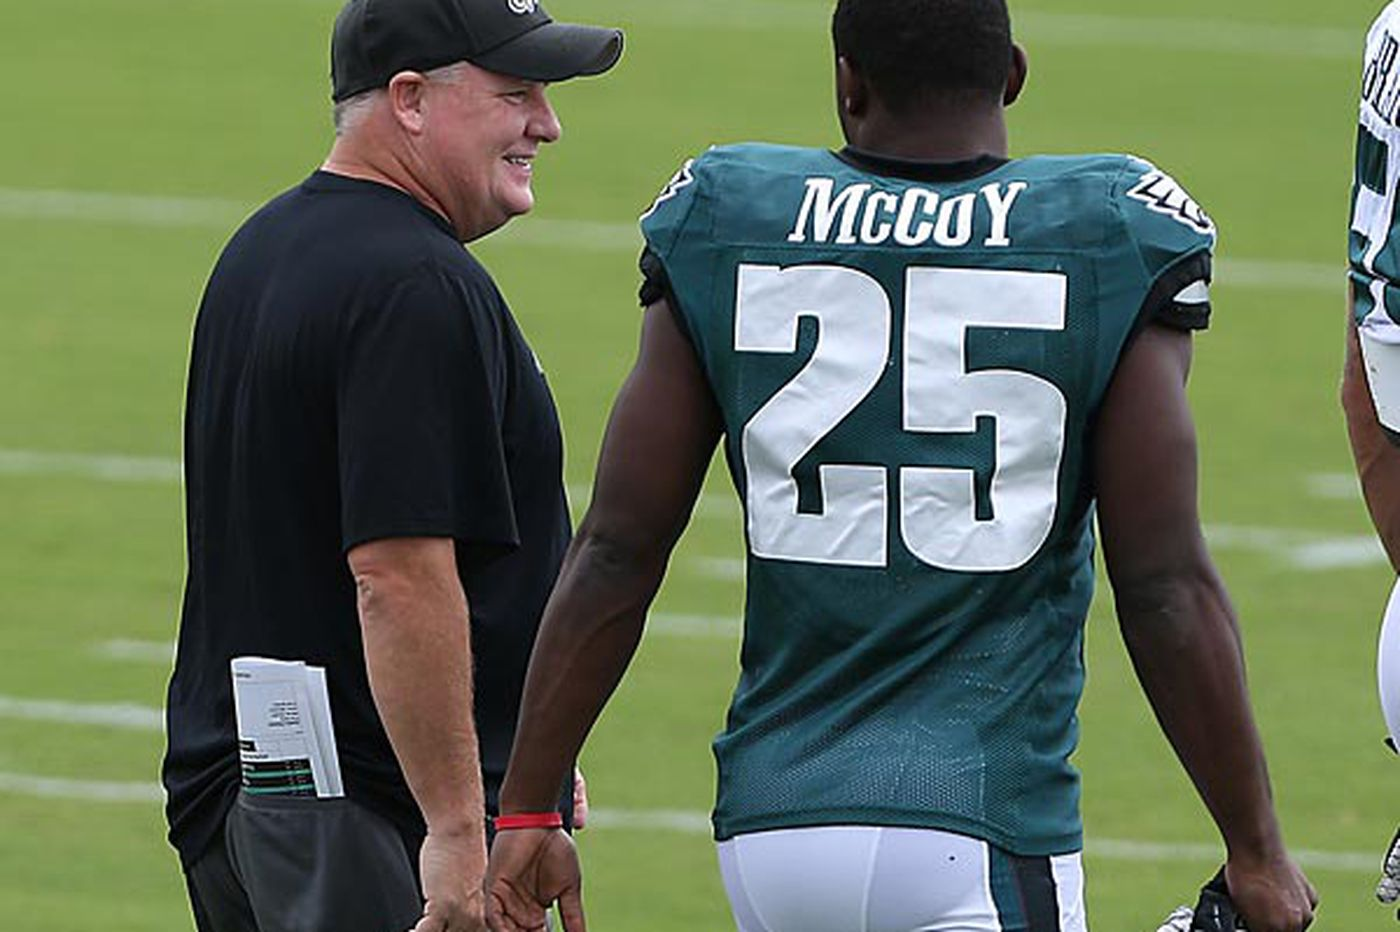 Why Chip Kelly lost faith in LeSean McCoy